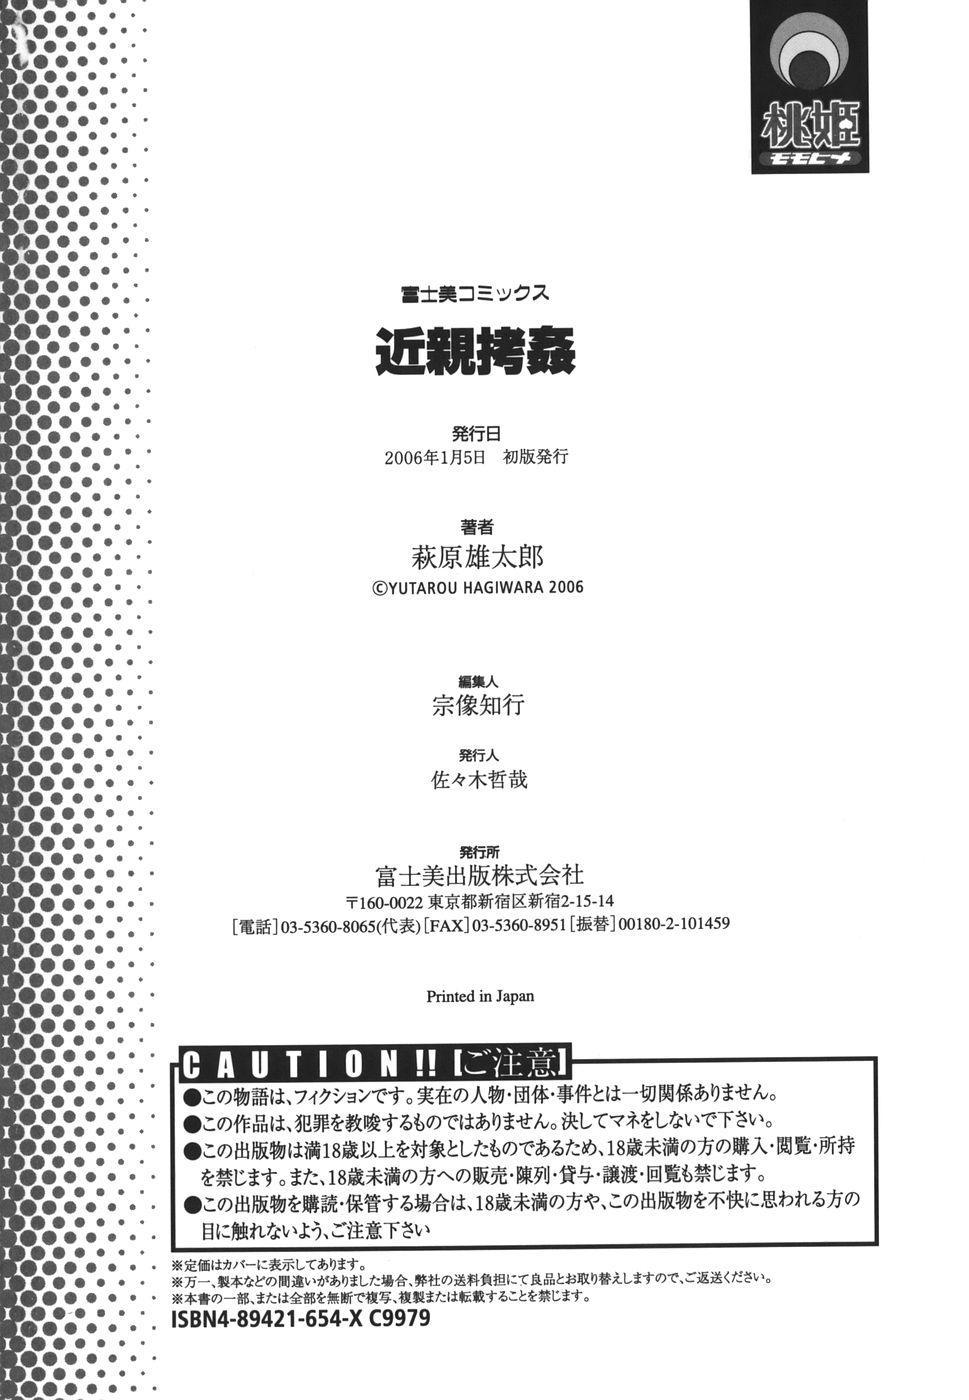 Kinshin Goukan - Near Relation Rapes 213